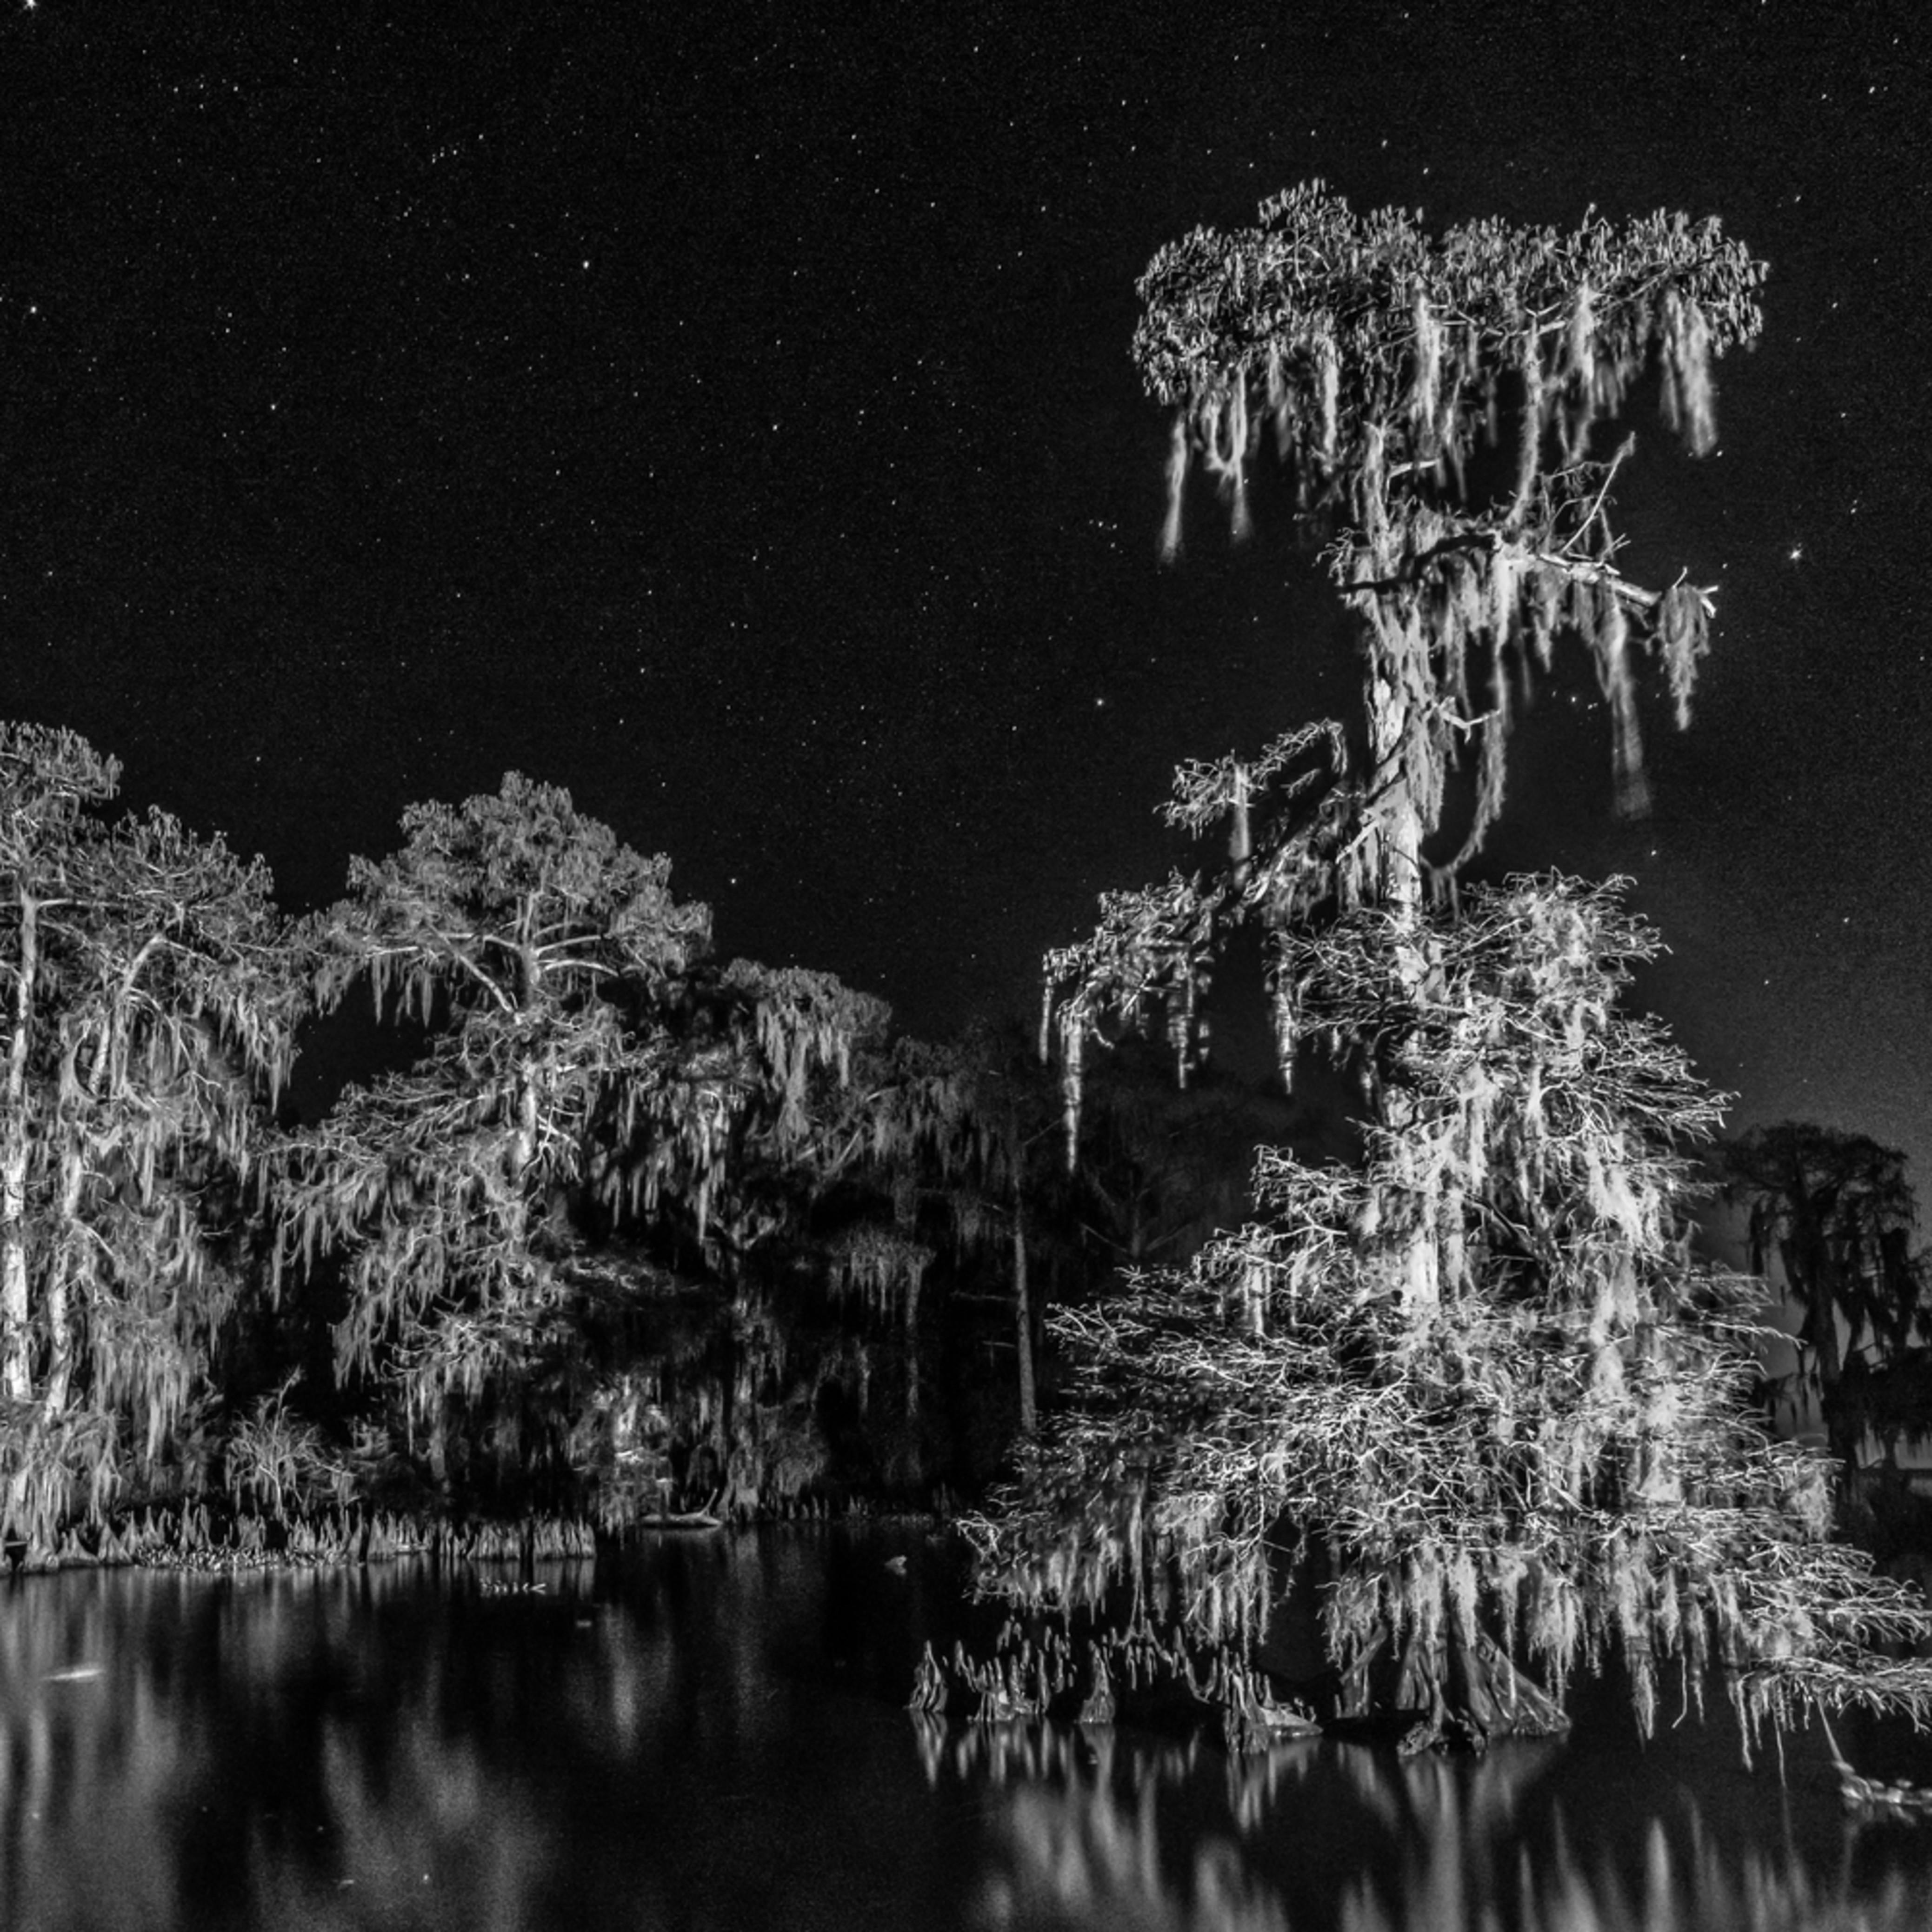 Andy crawford photography 190106 lake maurepas swamp 002 ojais2